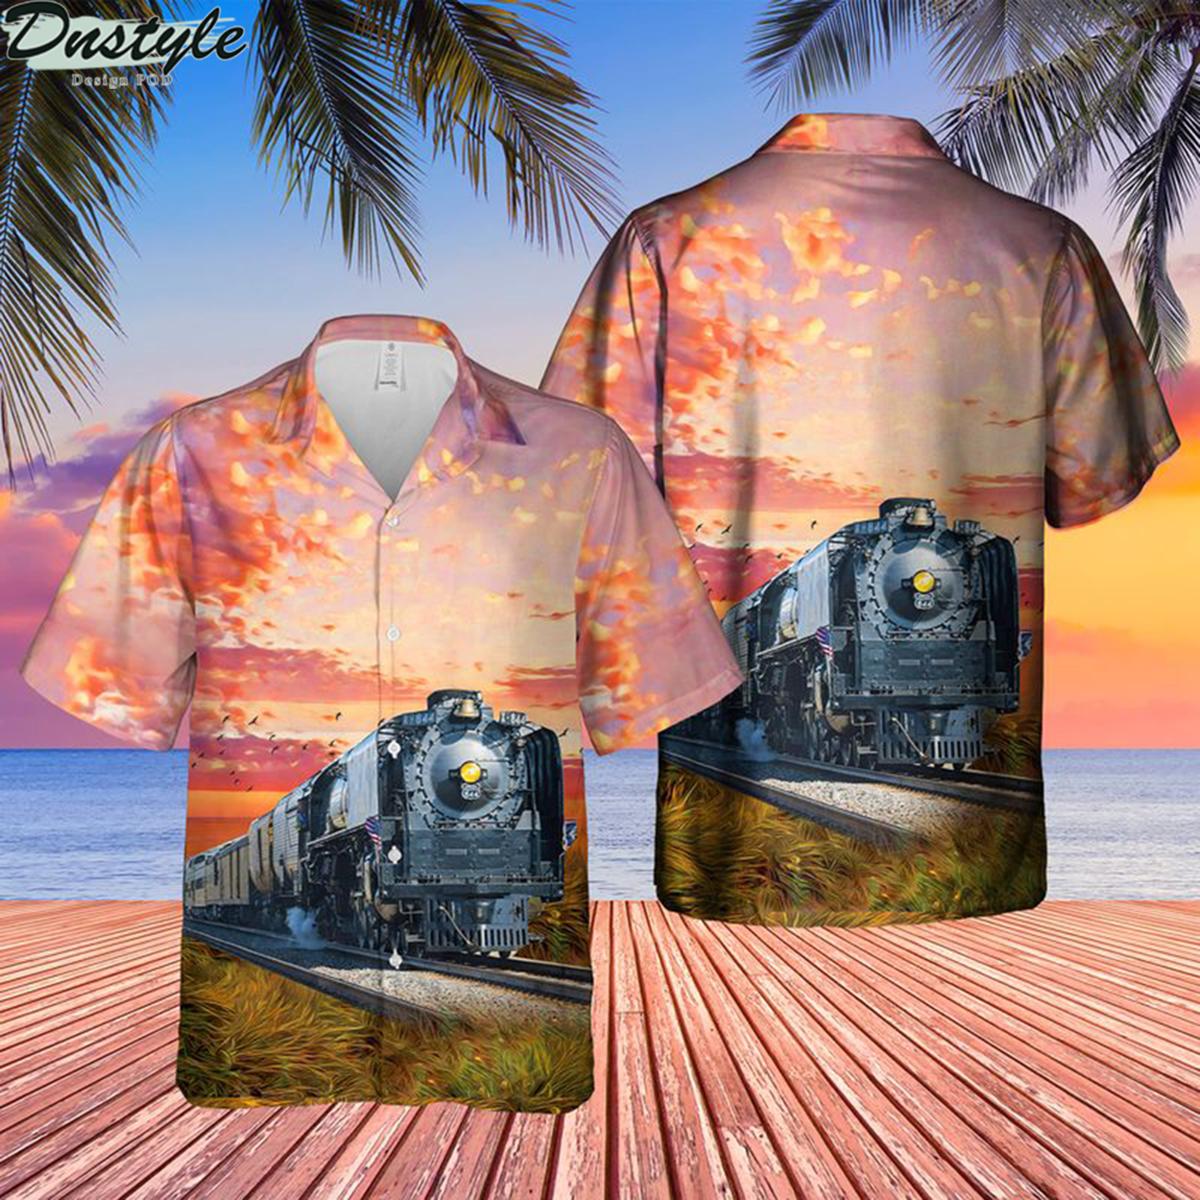 Union pacific living legend no 844 hawaiian shirt 2